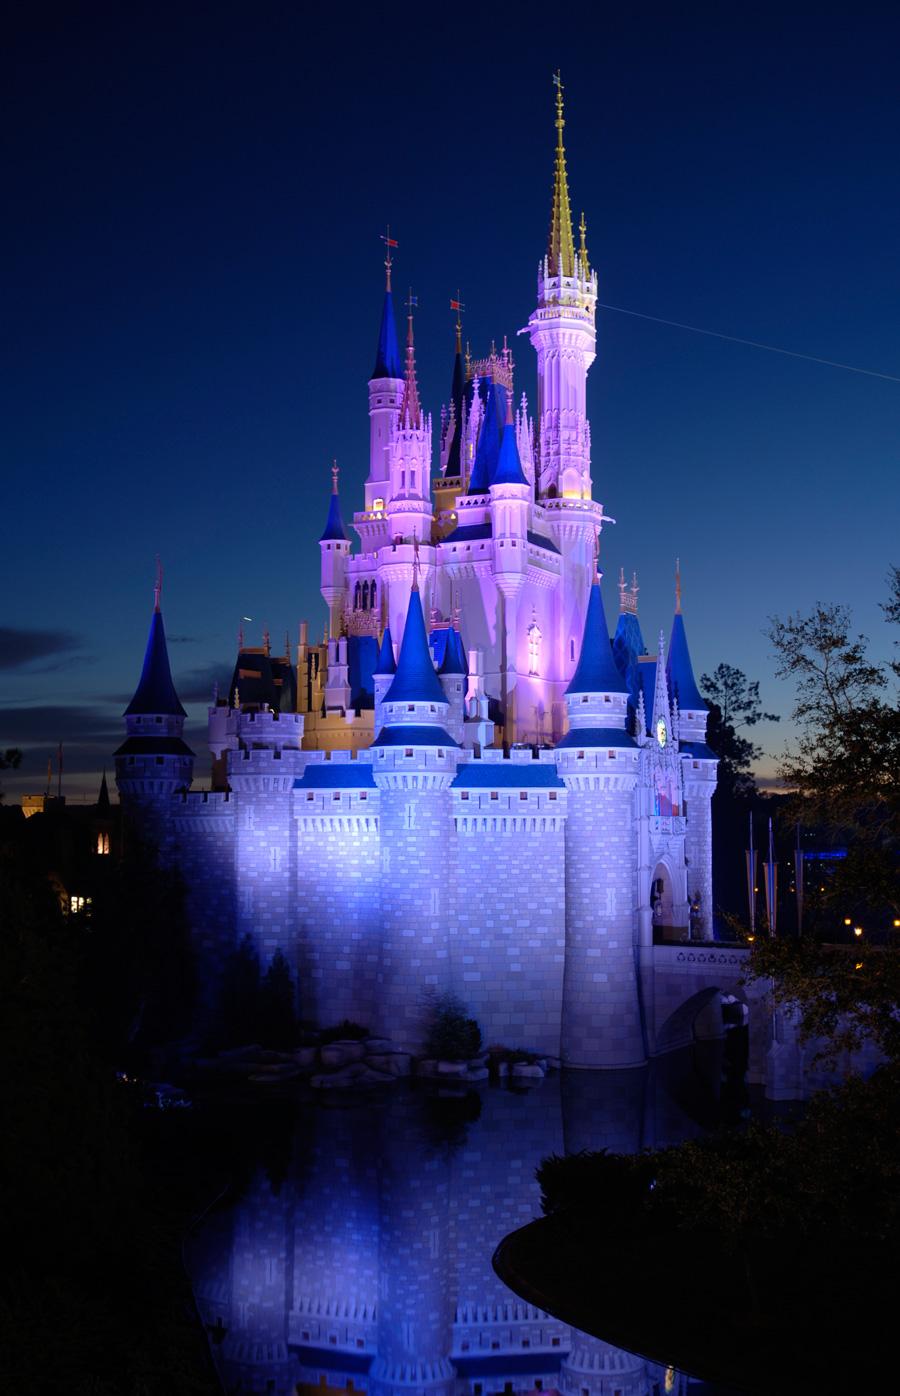 Top 10 Proposal Ideas at Disney « Disney Parks Blog